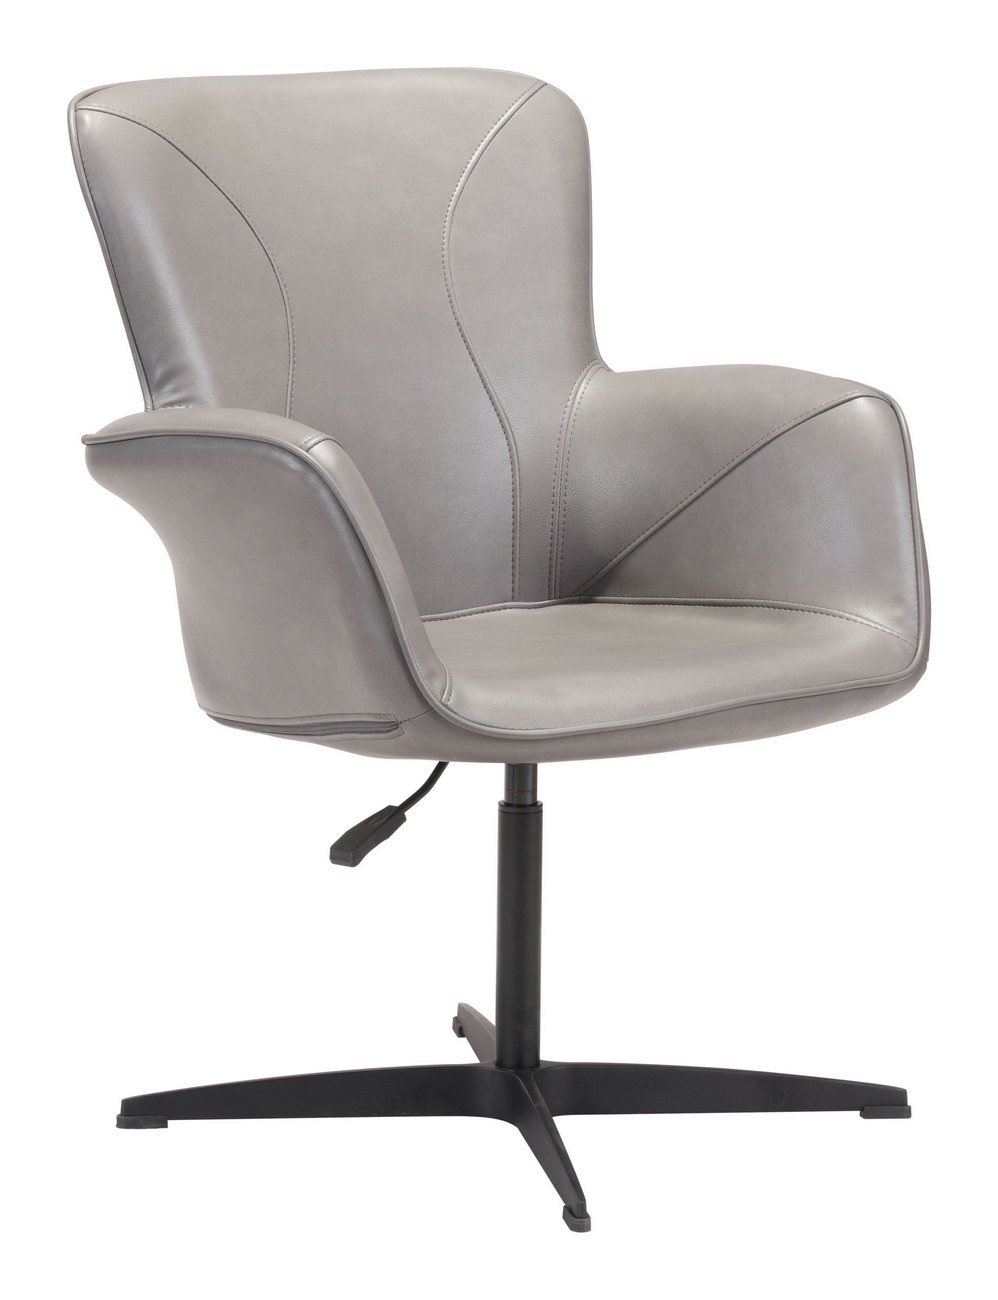 Zuo Alain Arm Chair Gray